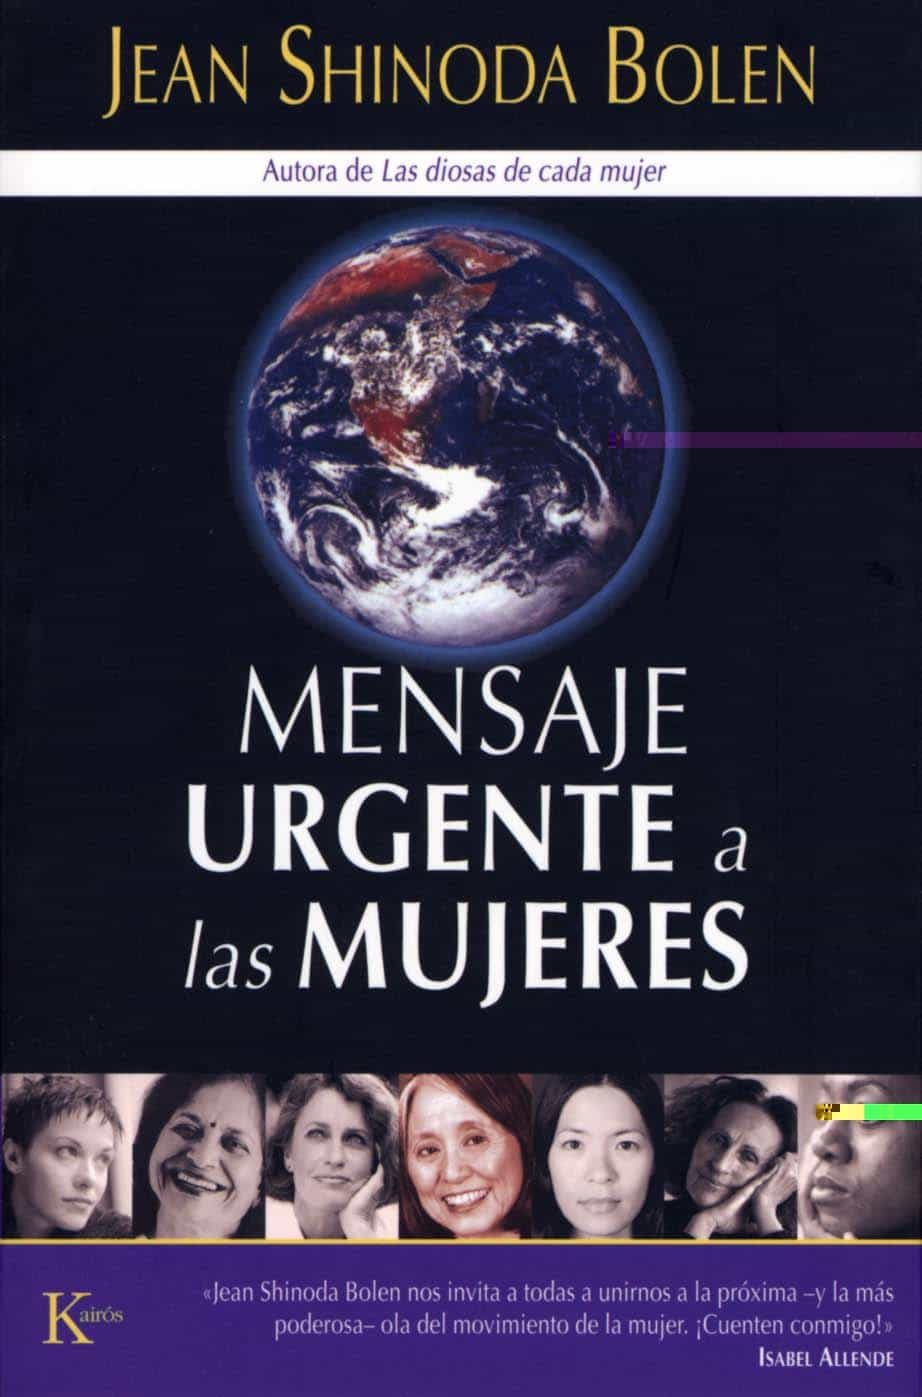 Mensaje urgente a las mujeres jean shinoda bolen comprar libro mensaje urgente a las mujeres jean shinoda bolen 9788472456112 fandeluxe Images